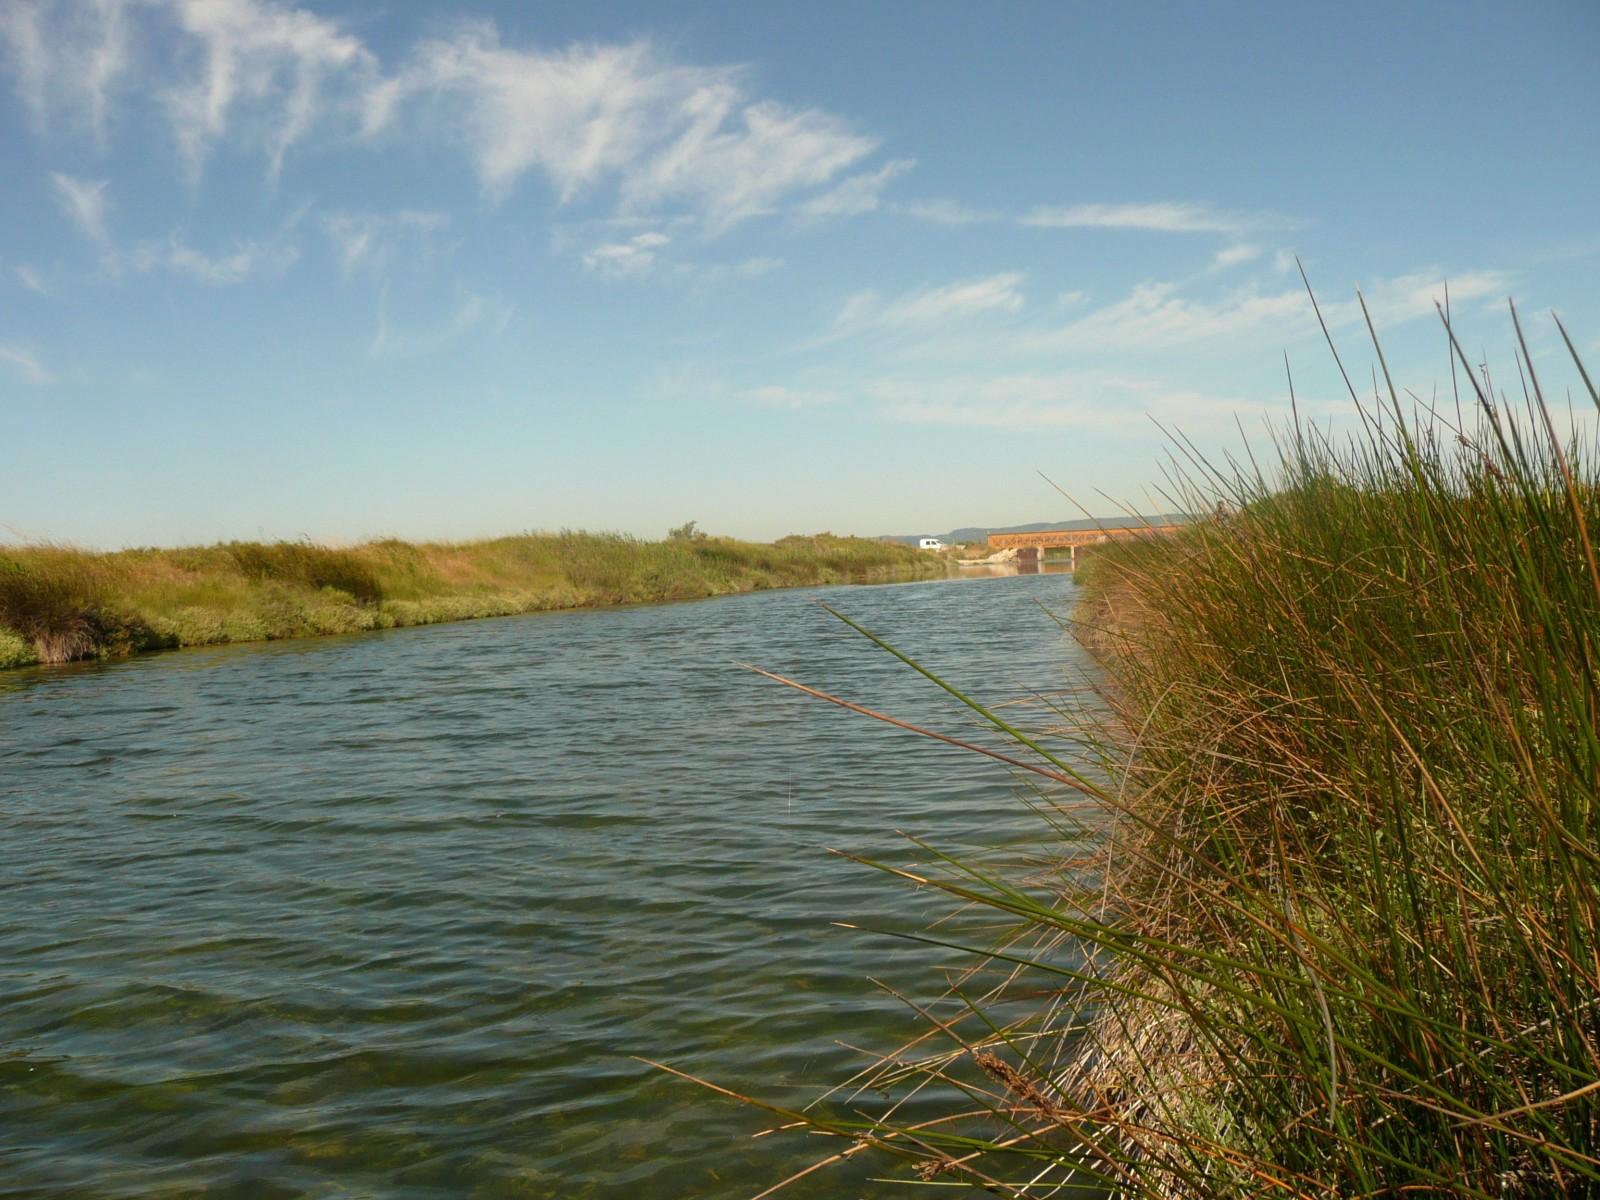 Le canal Ste Marie